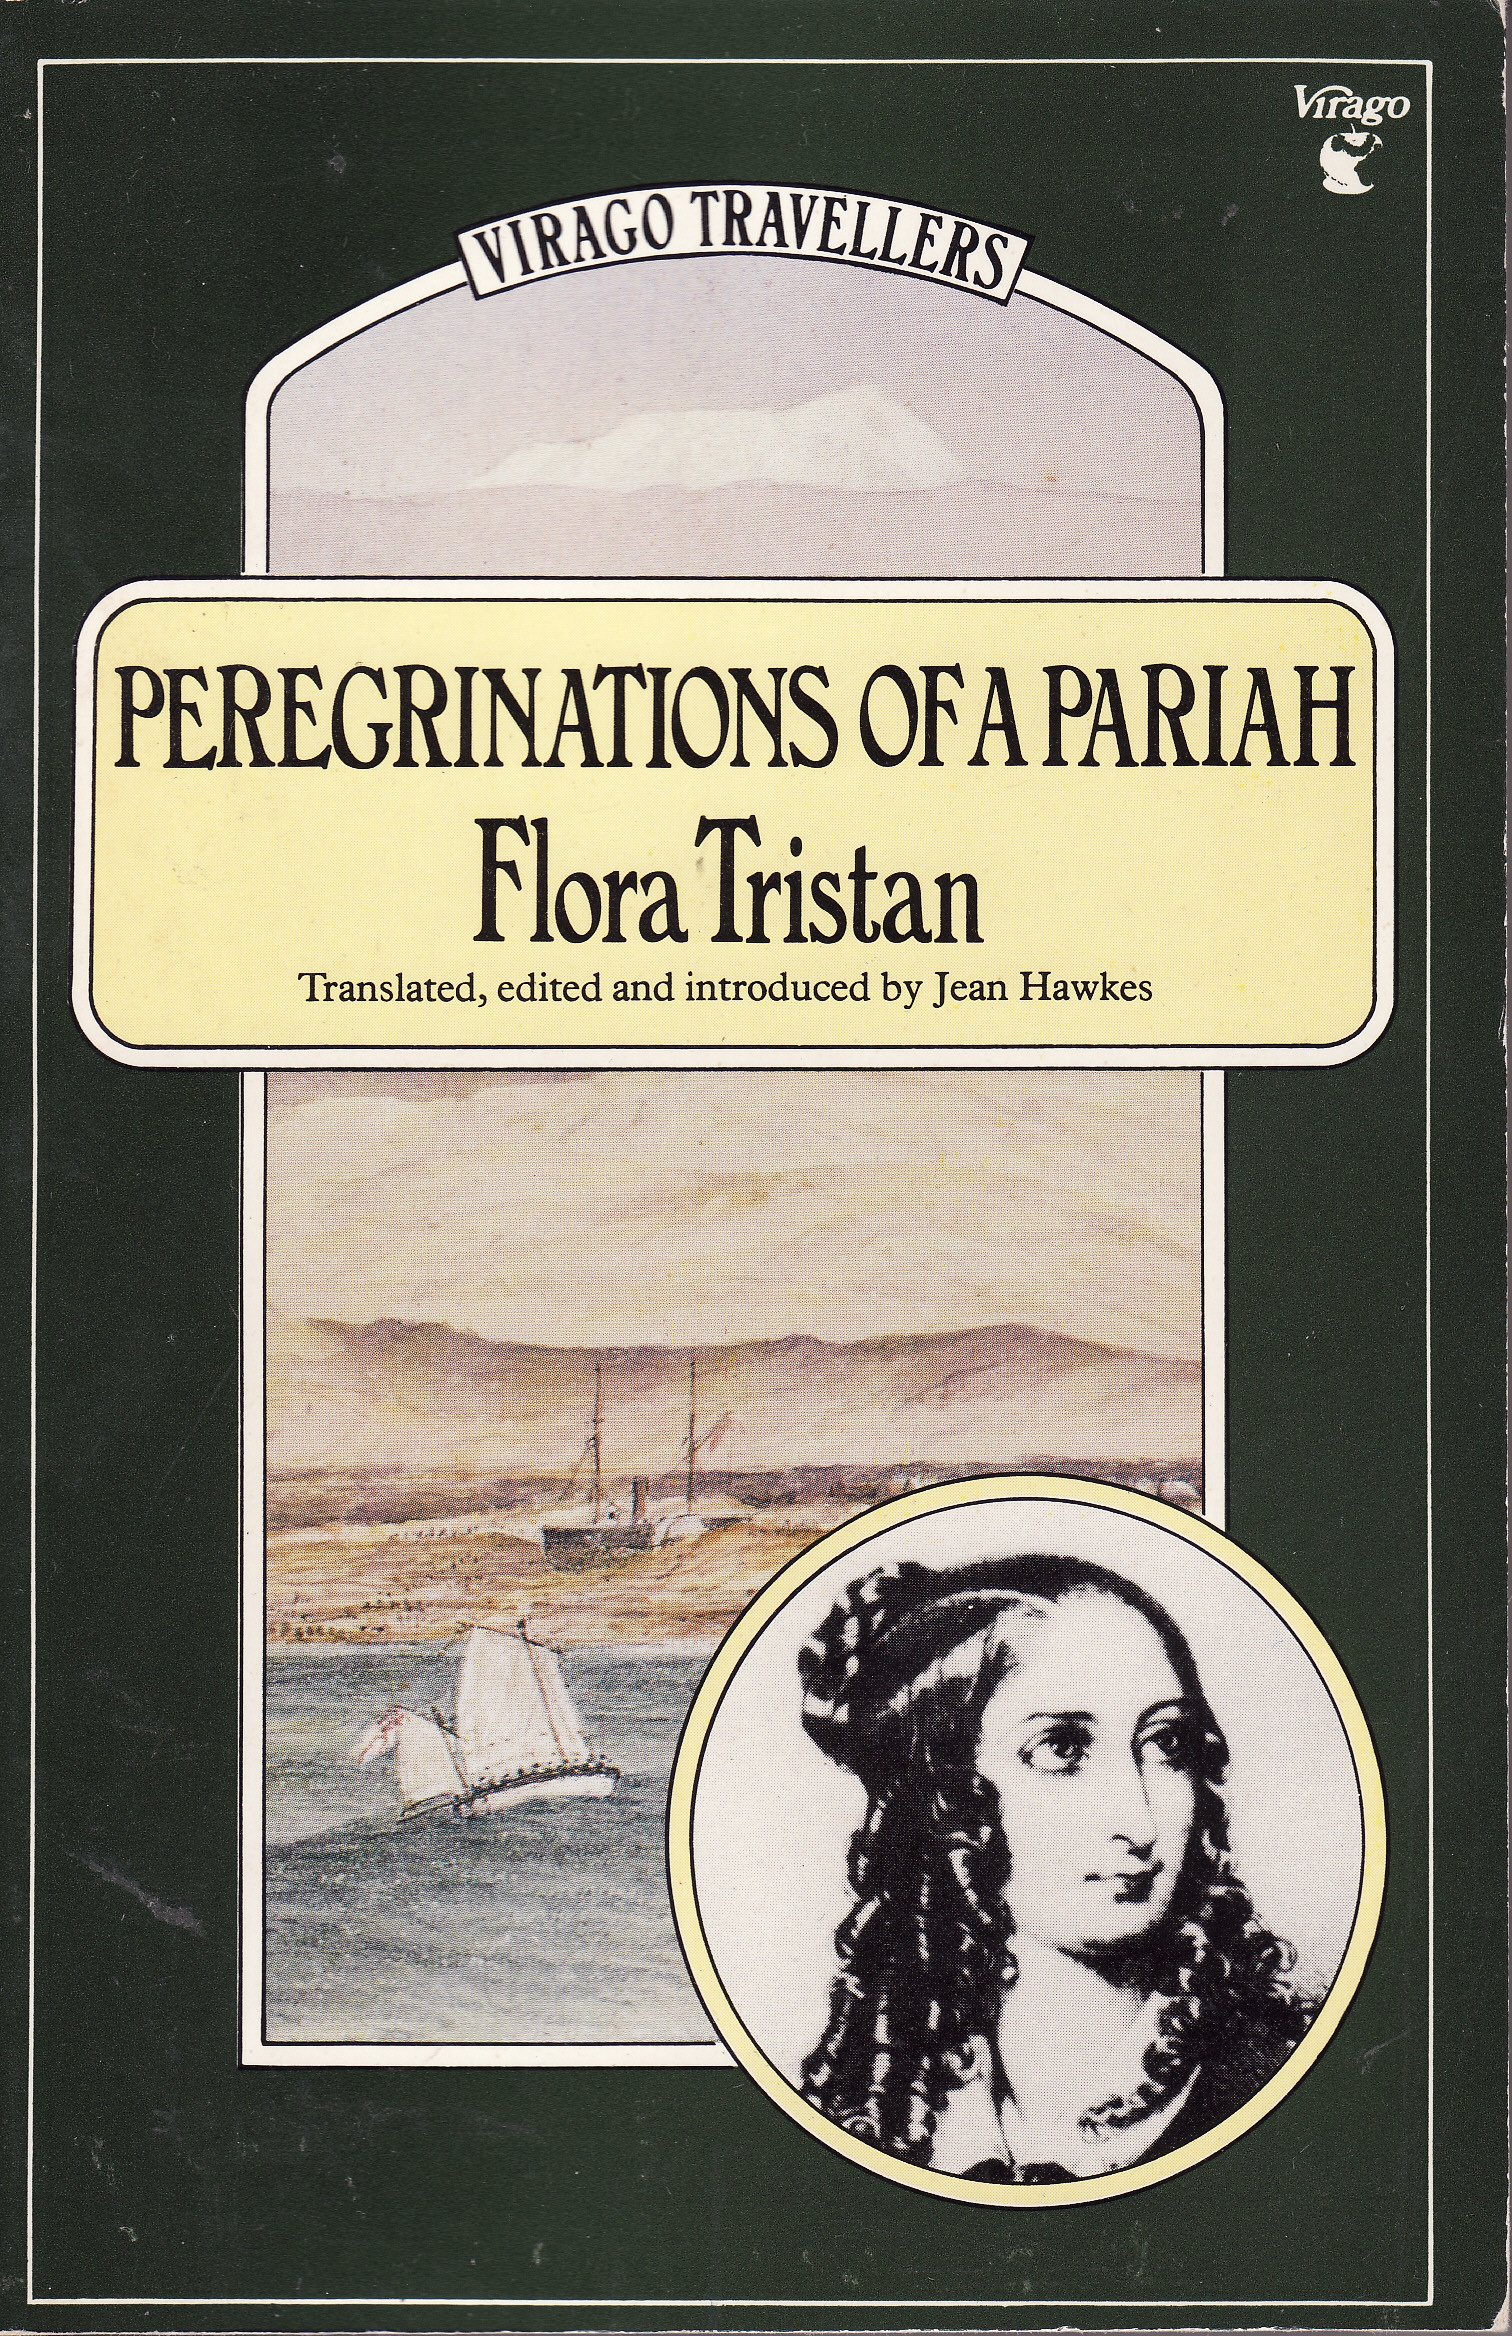 Peregrinations Of A Pariah, 18331834 (virago Travellers): Amazon:  Flora Tristan, Jean Hawkes: 9780860684770: Books